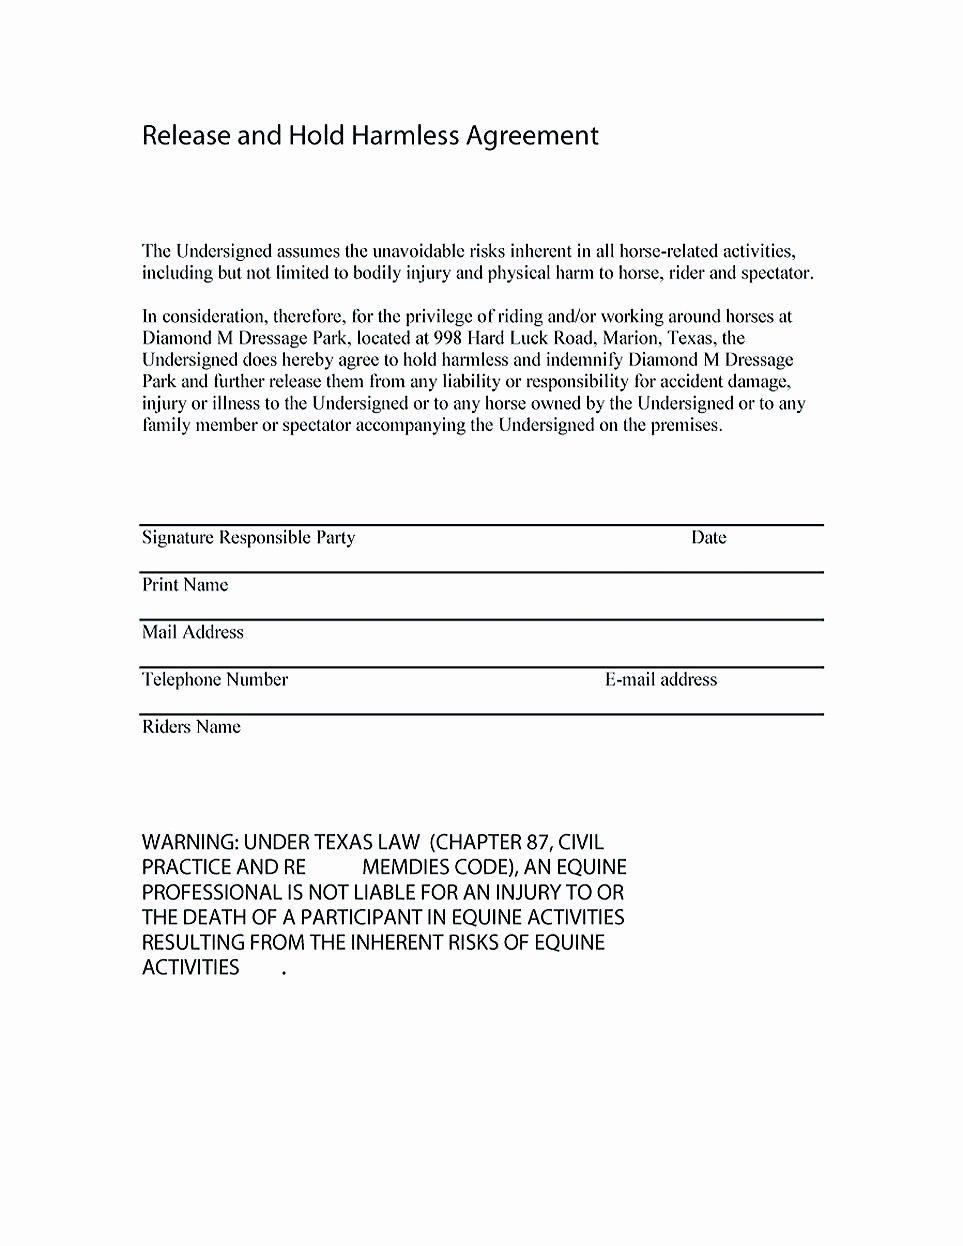 Free Hold Harmless Agreement Template Elegant Making Hold Harmless Agreement Template for Different Purposes